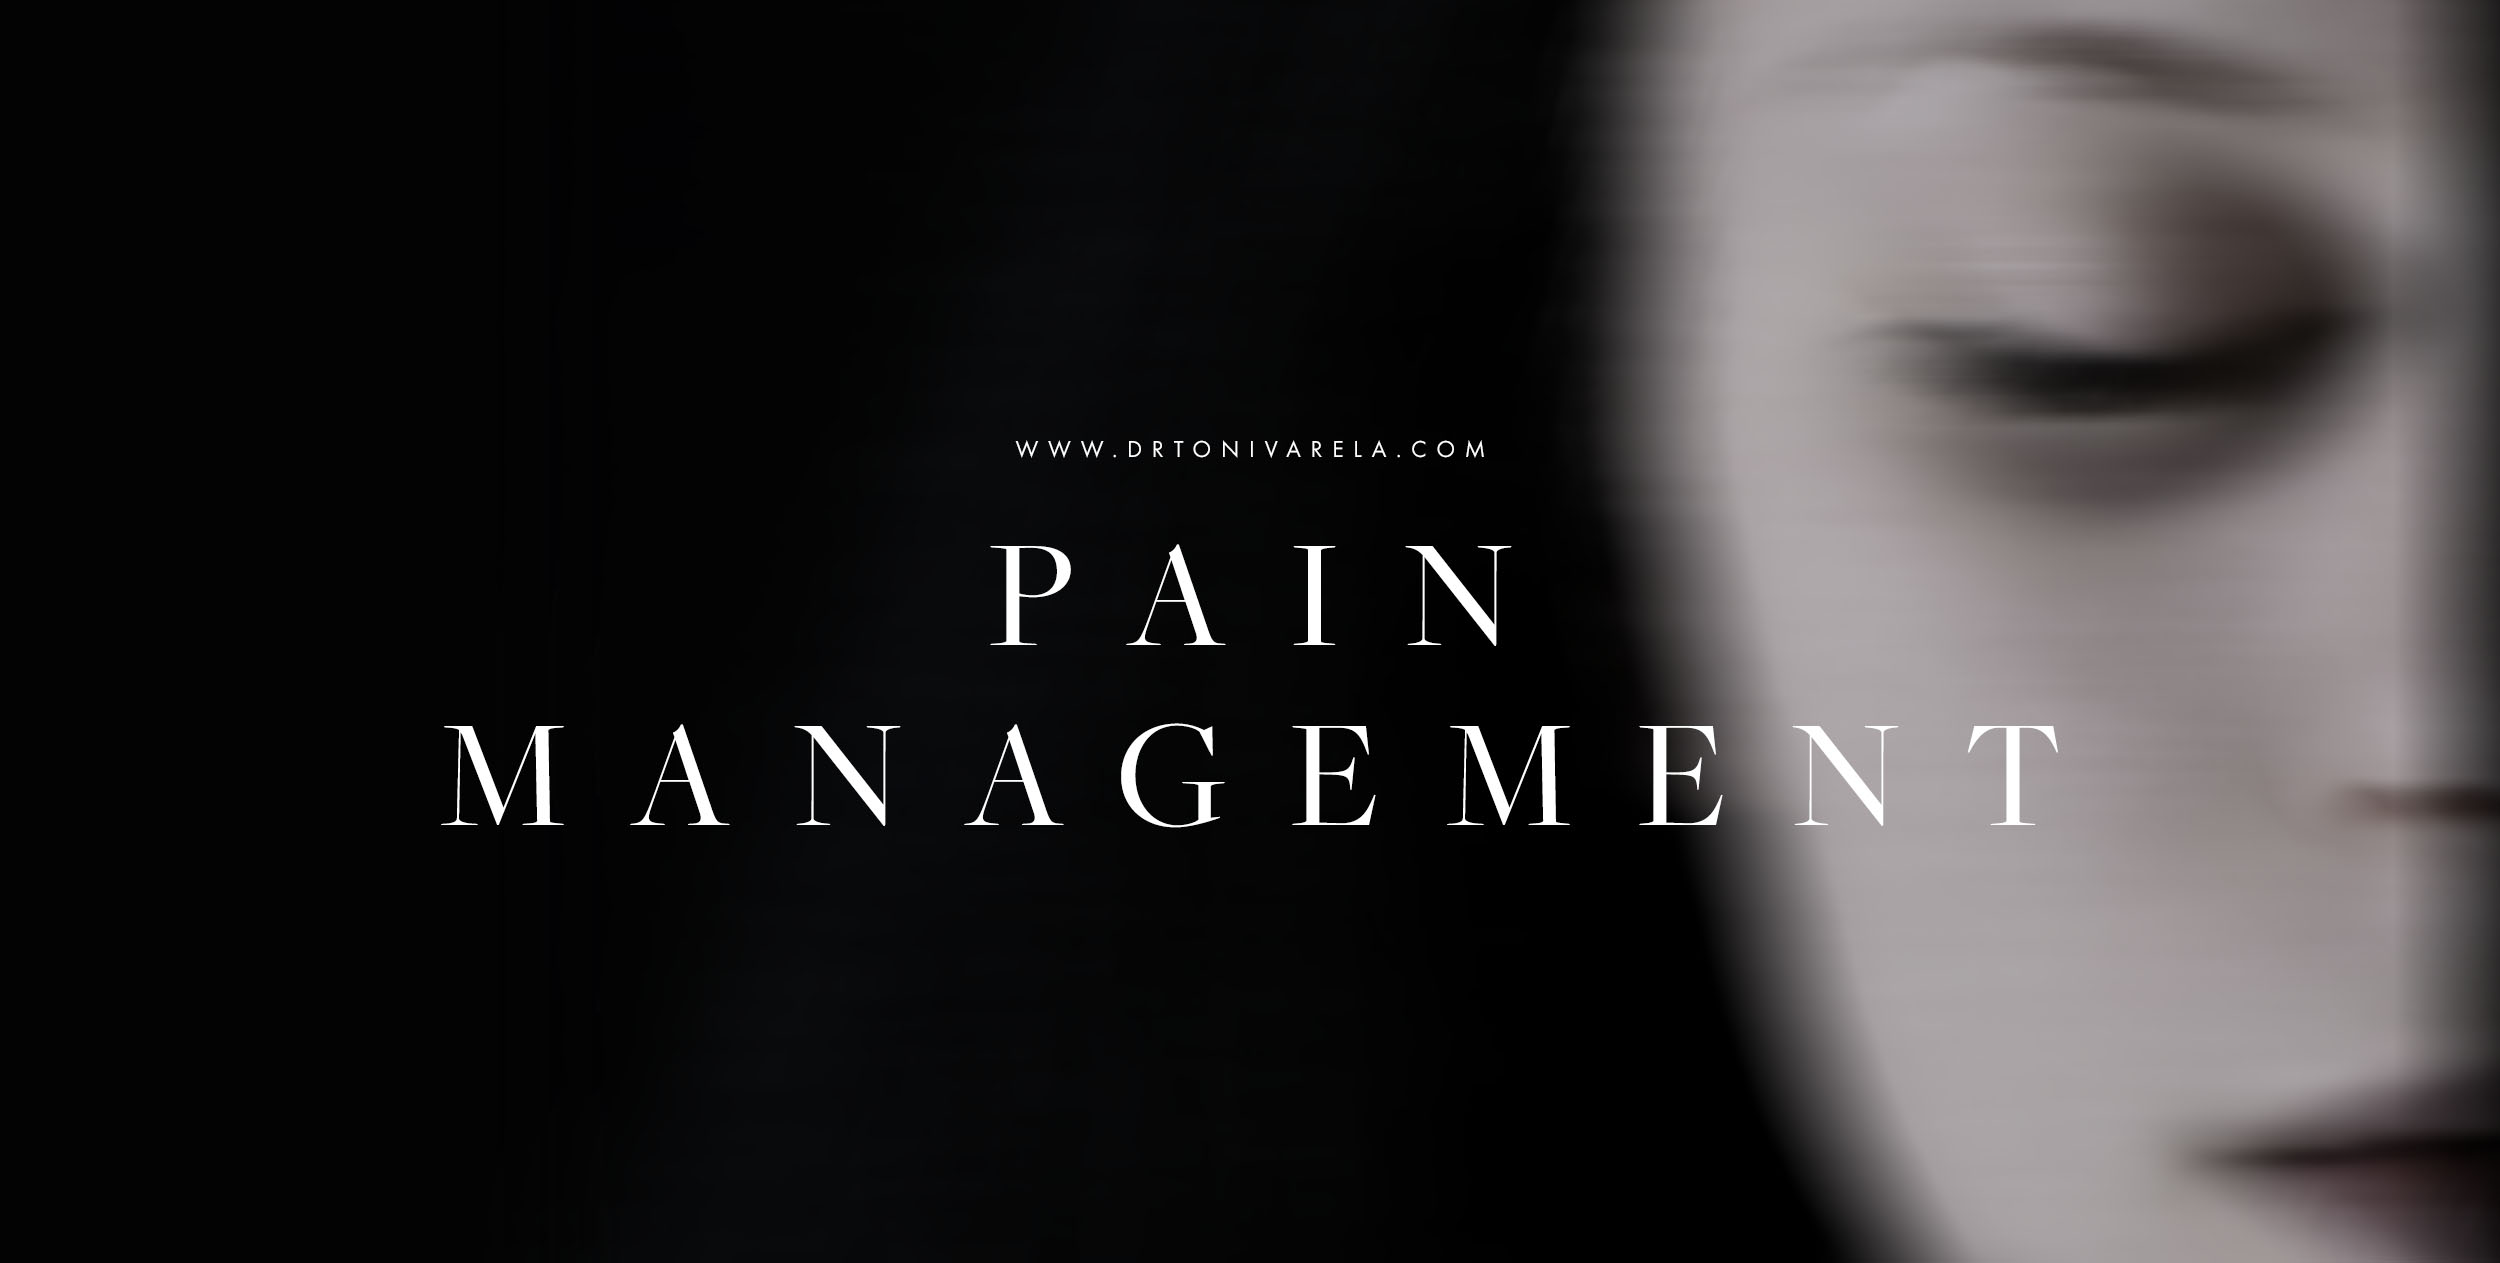 painmanagement.jpg